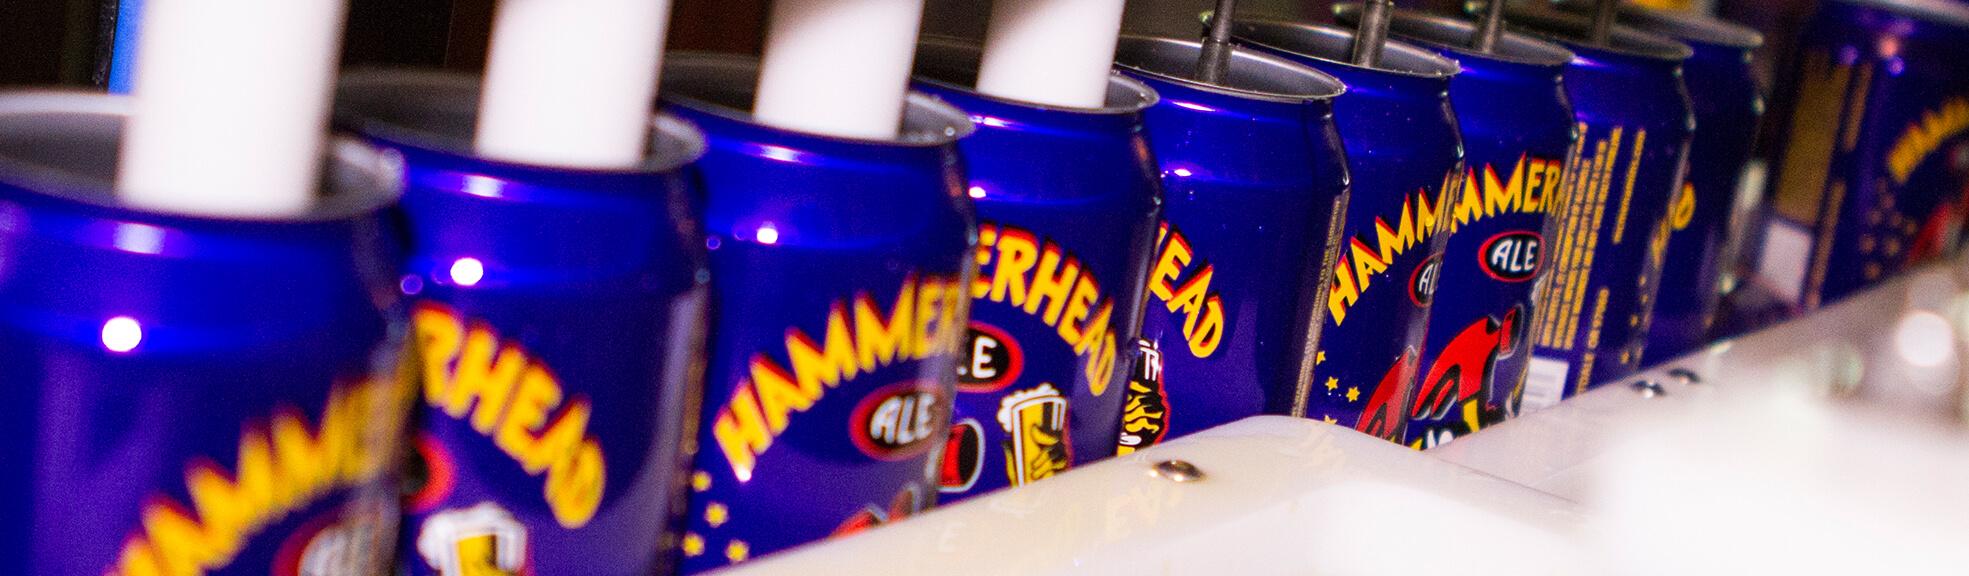 <h3 >McMenamins Breweries</h3>